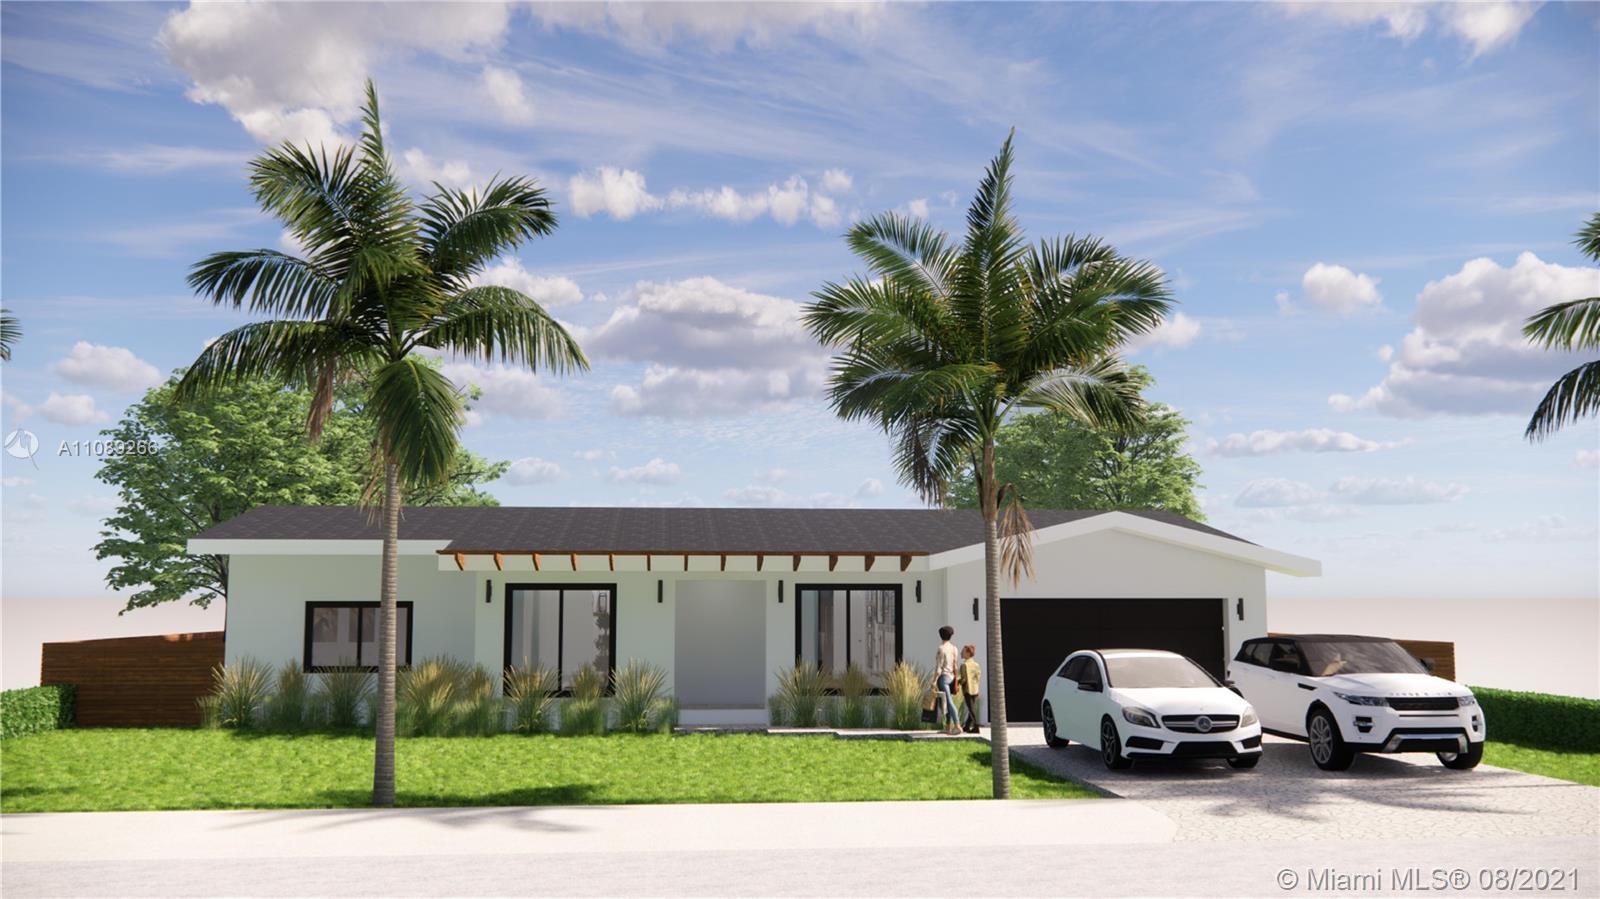 830 NE 116th St, Biscayne Park, Florida 33161